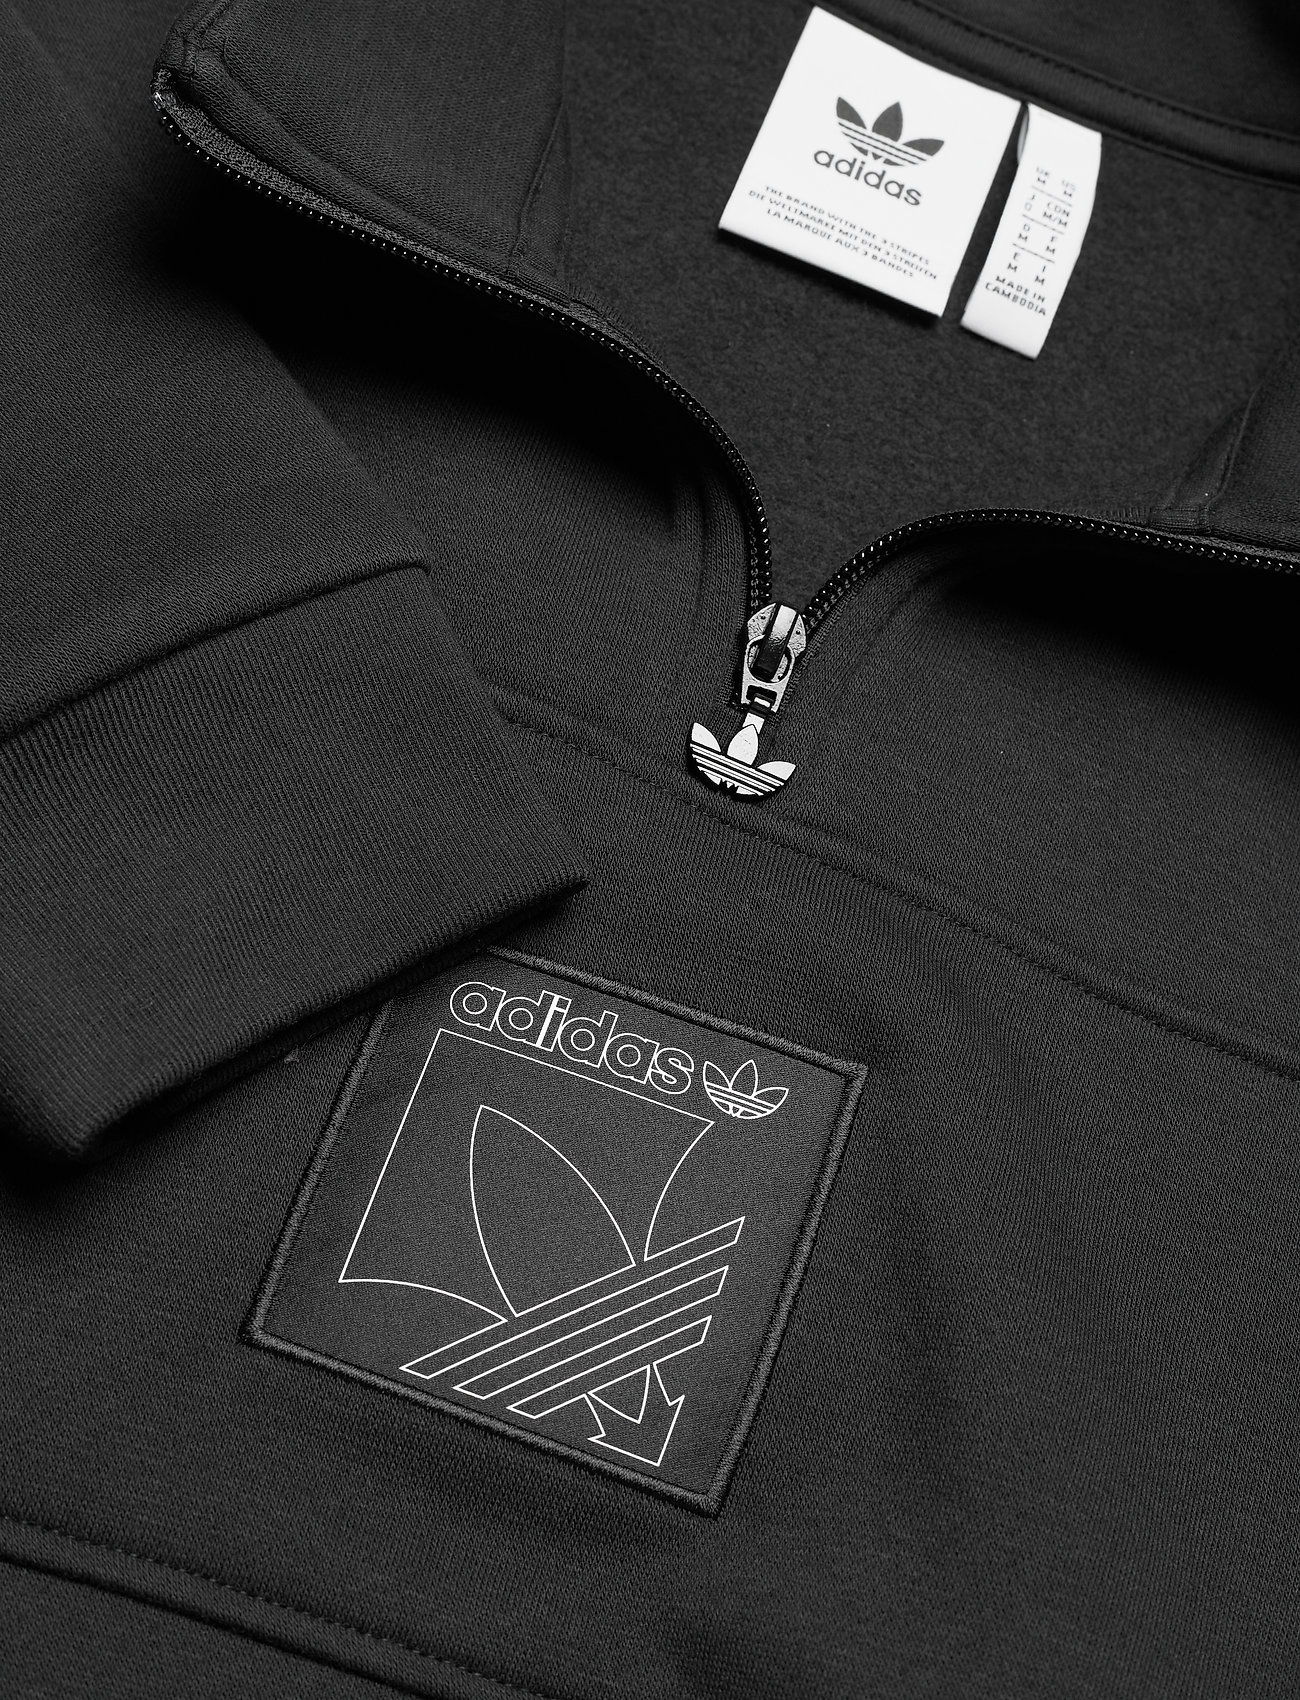 adidas Originals SPRT ICON QZTT - Sweatshirts BLACK - Menn Klær